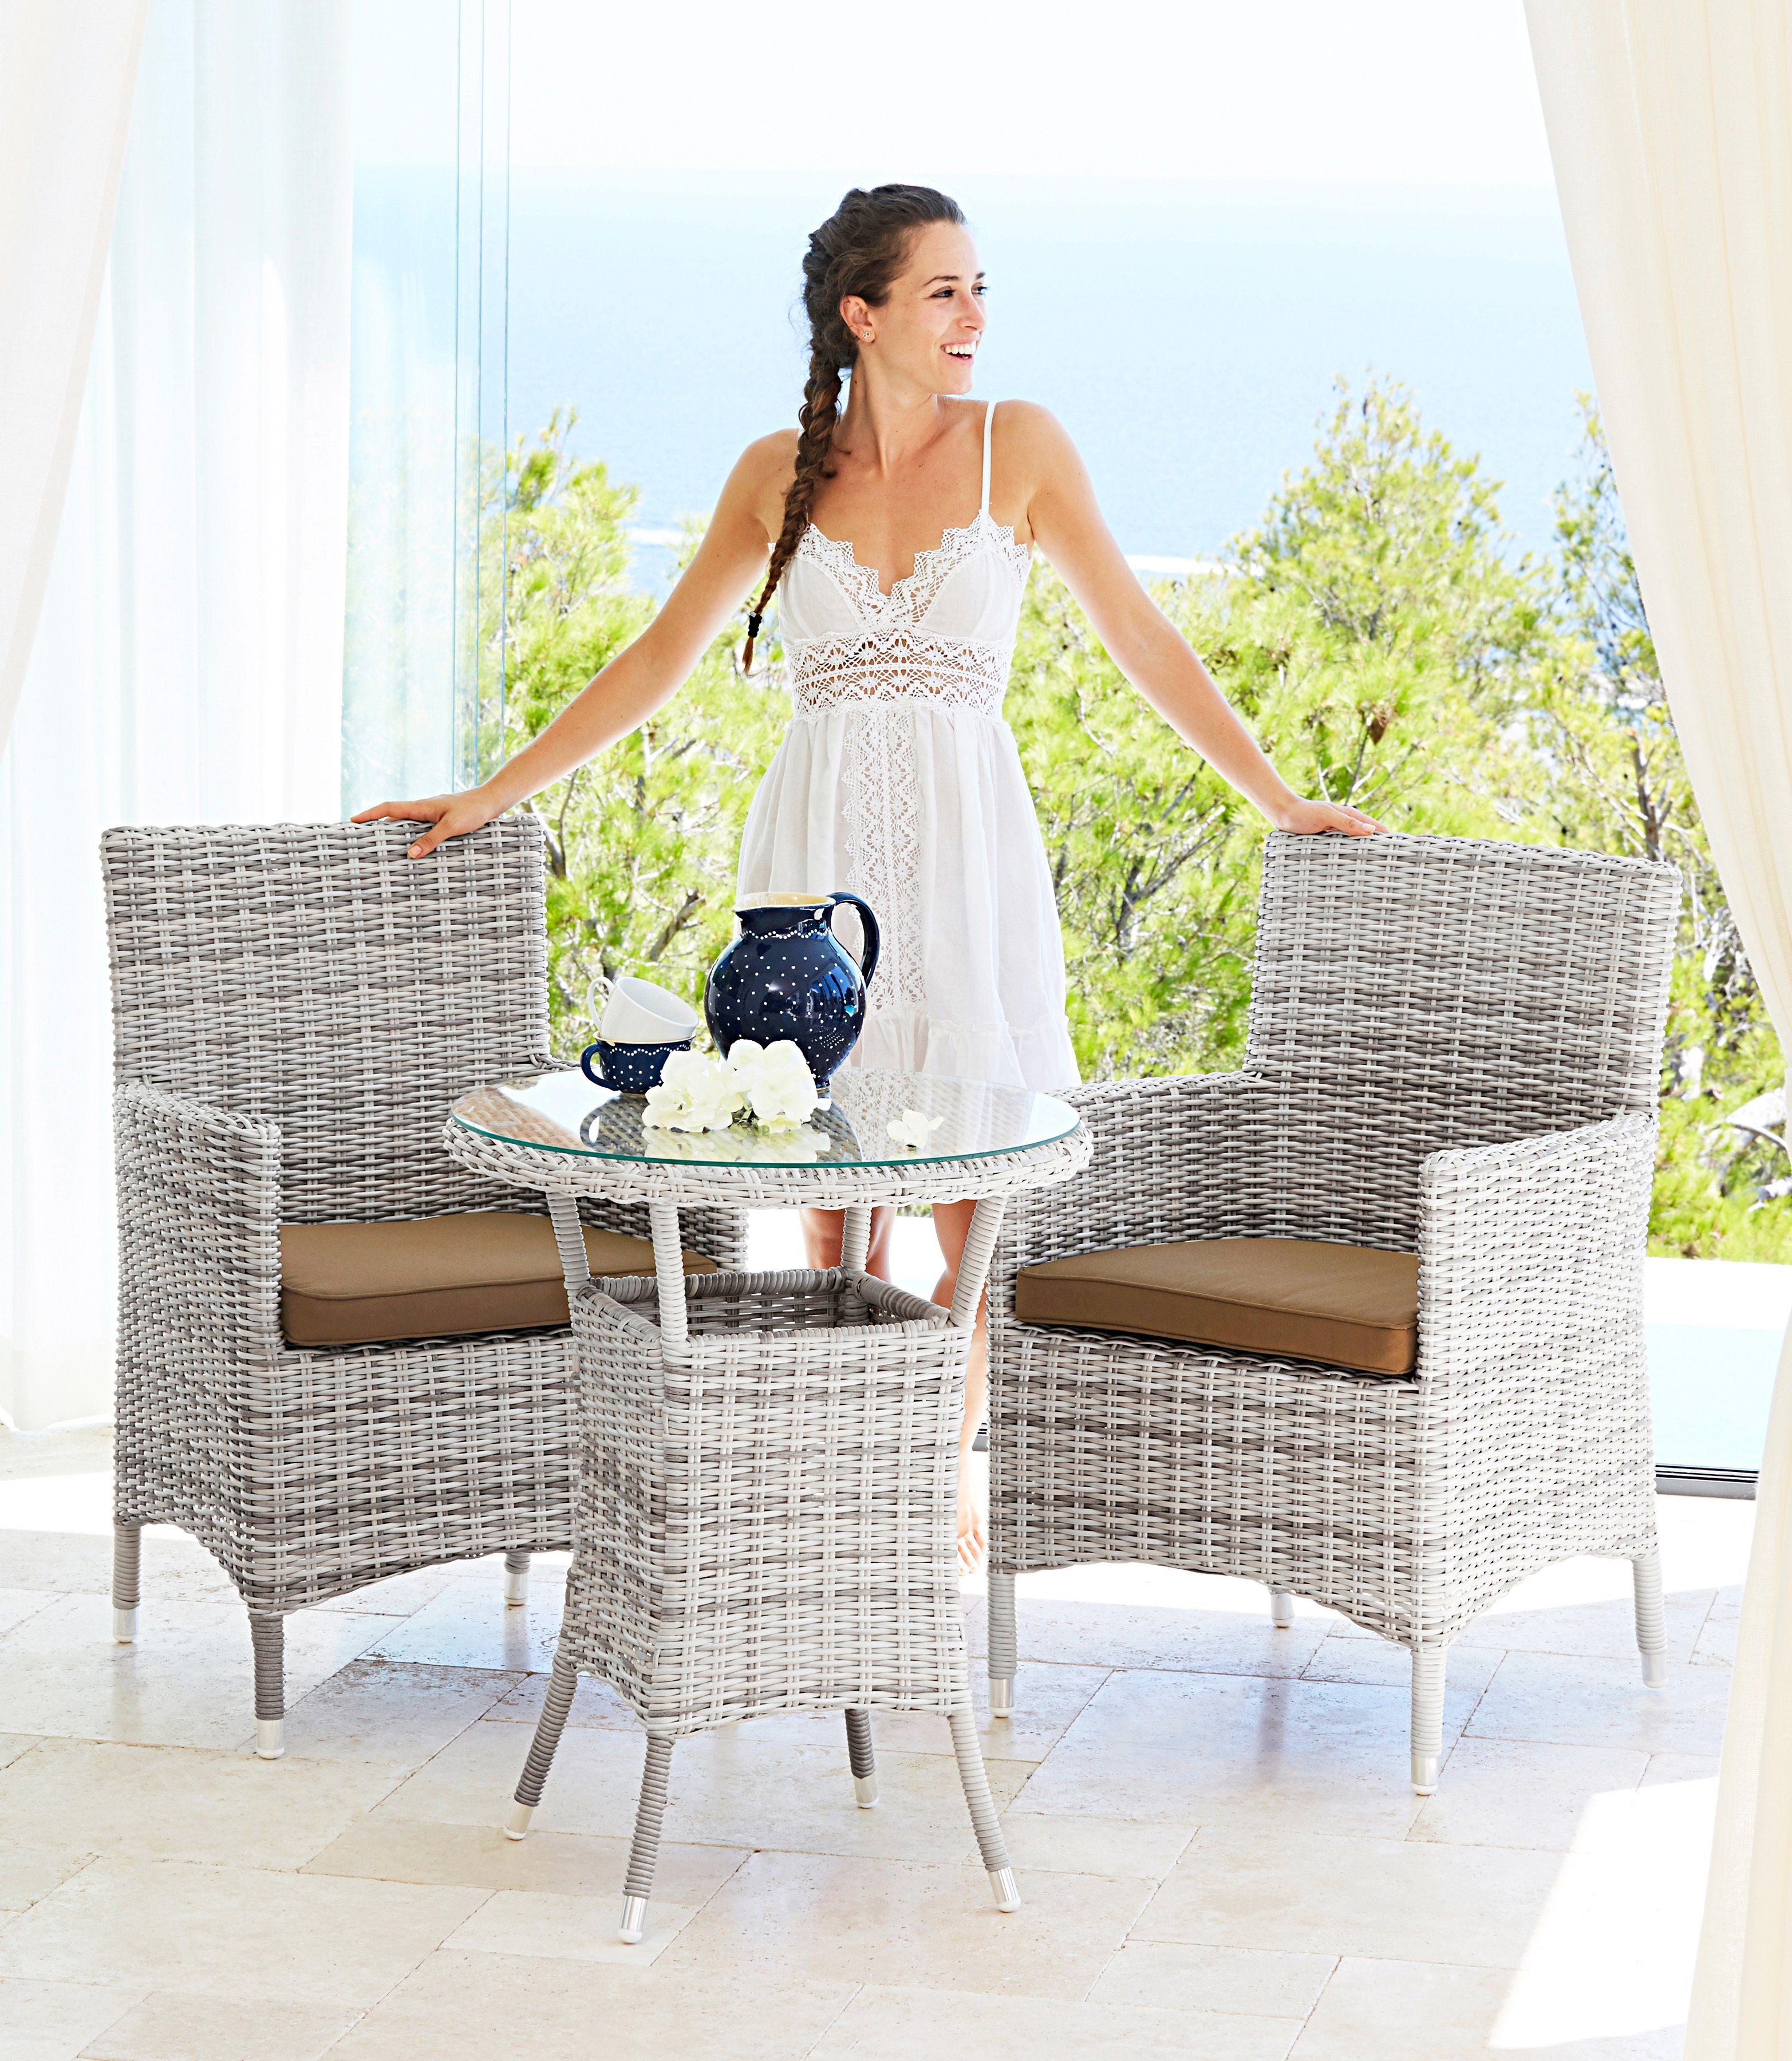 Gartenmöbelset »Bali«, 2 Sessel, 1 Tisch Ø 60 cm, Polyrattan, wollweiß